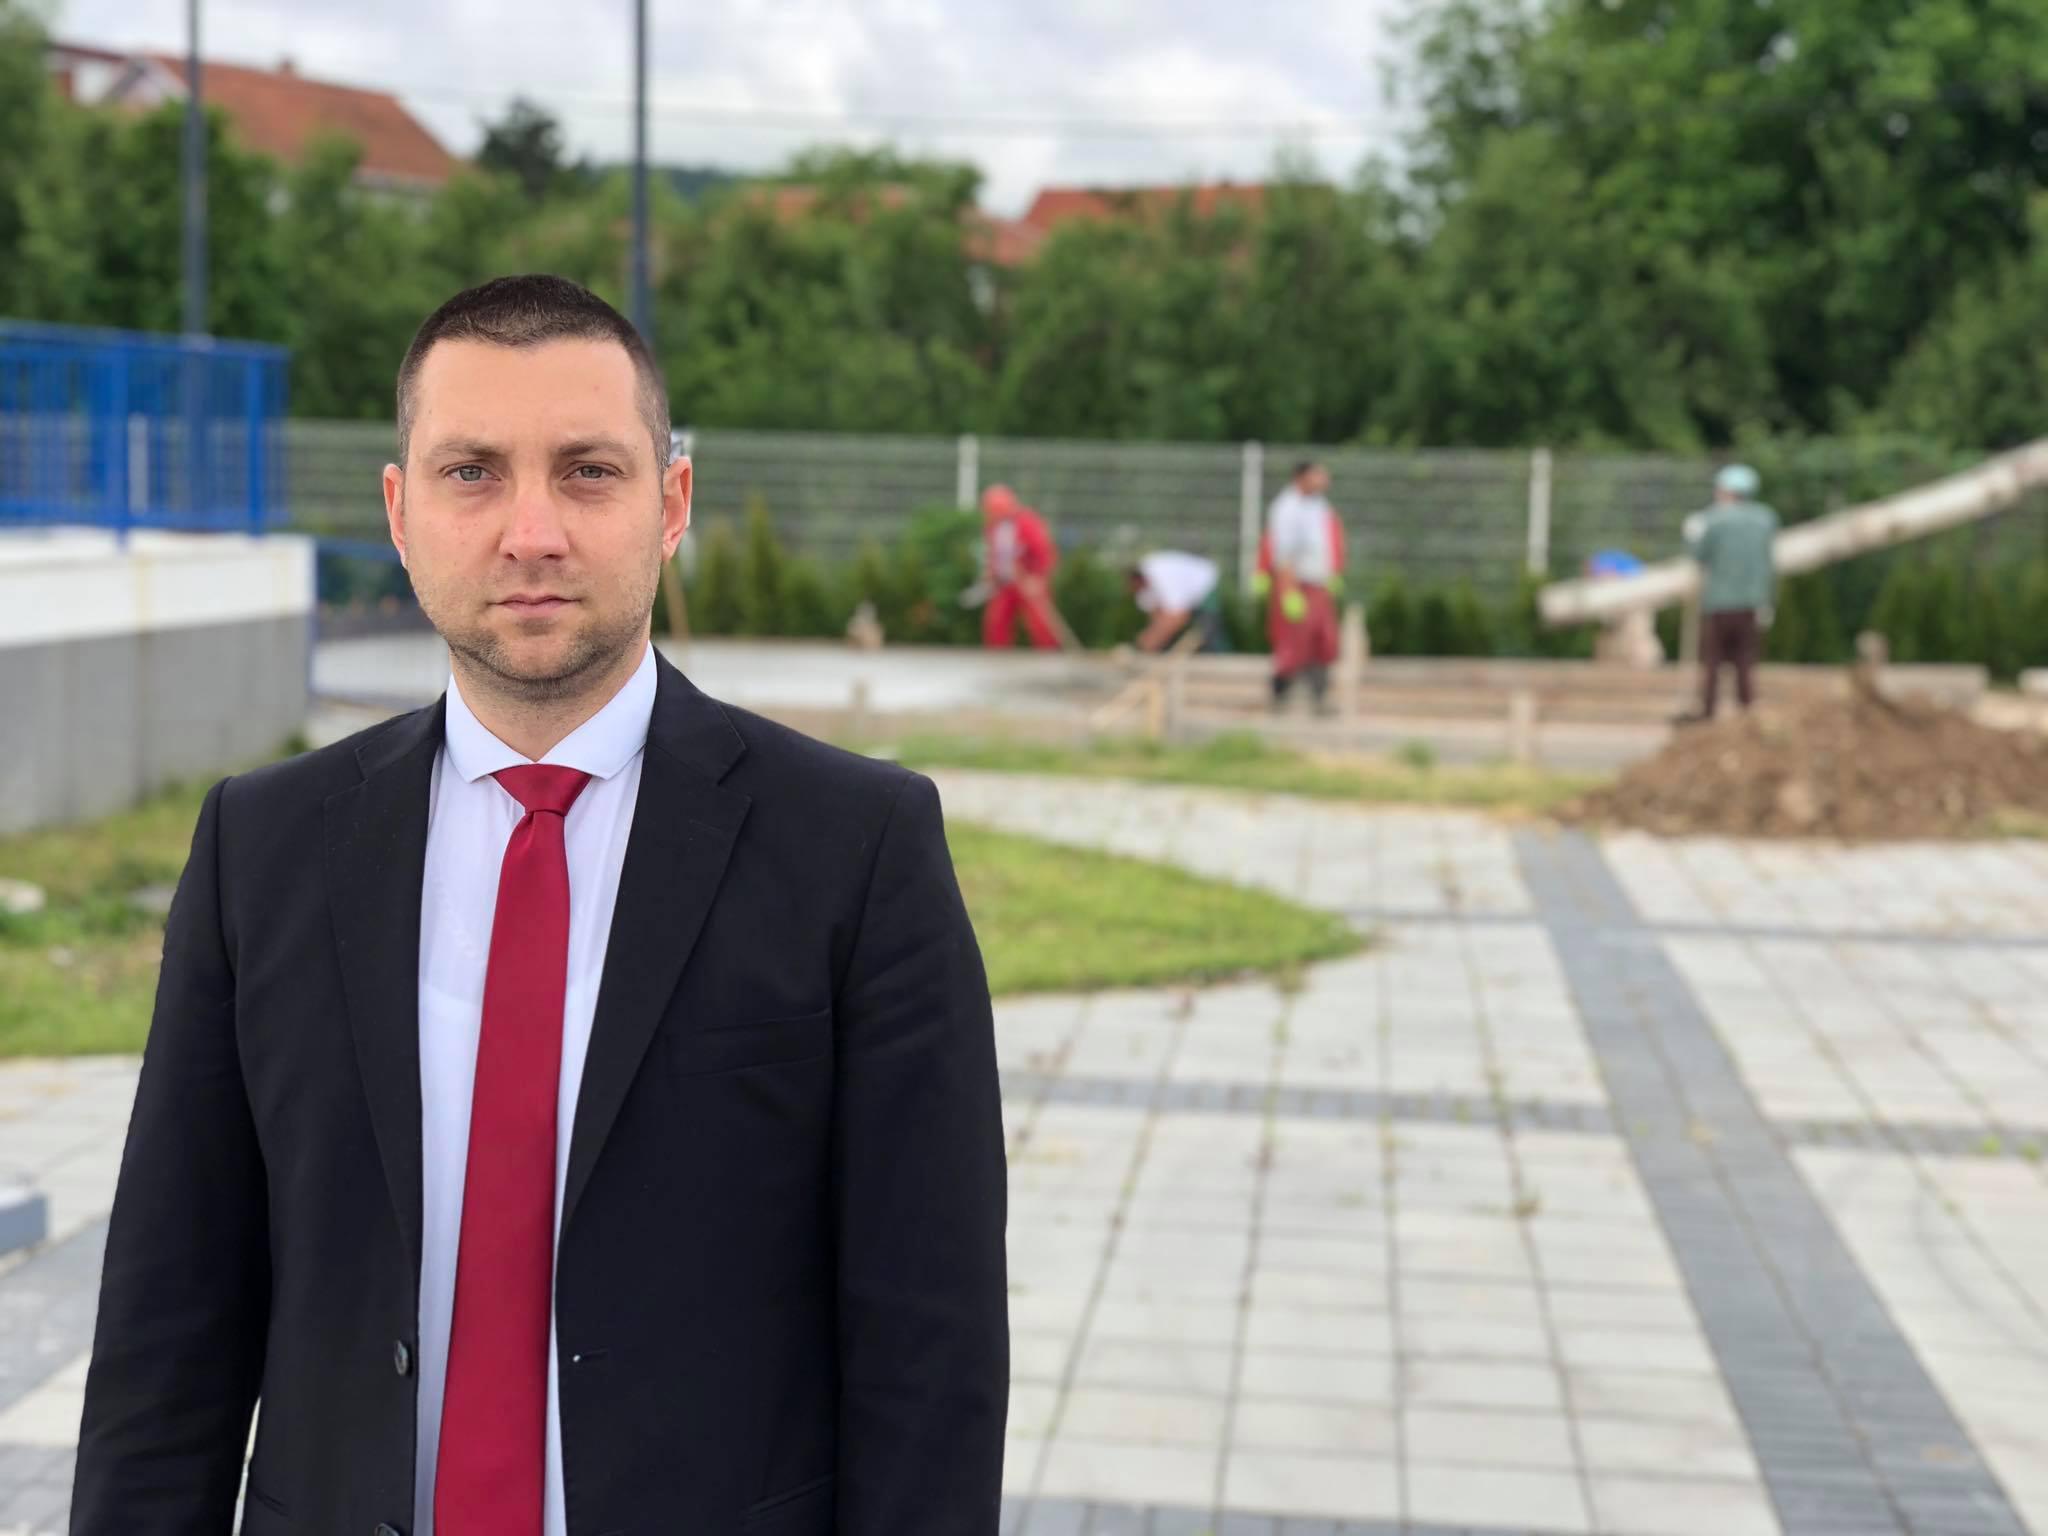 Izgradnja fut-tenis terena, Miroslav Marković, foto: M.M.